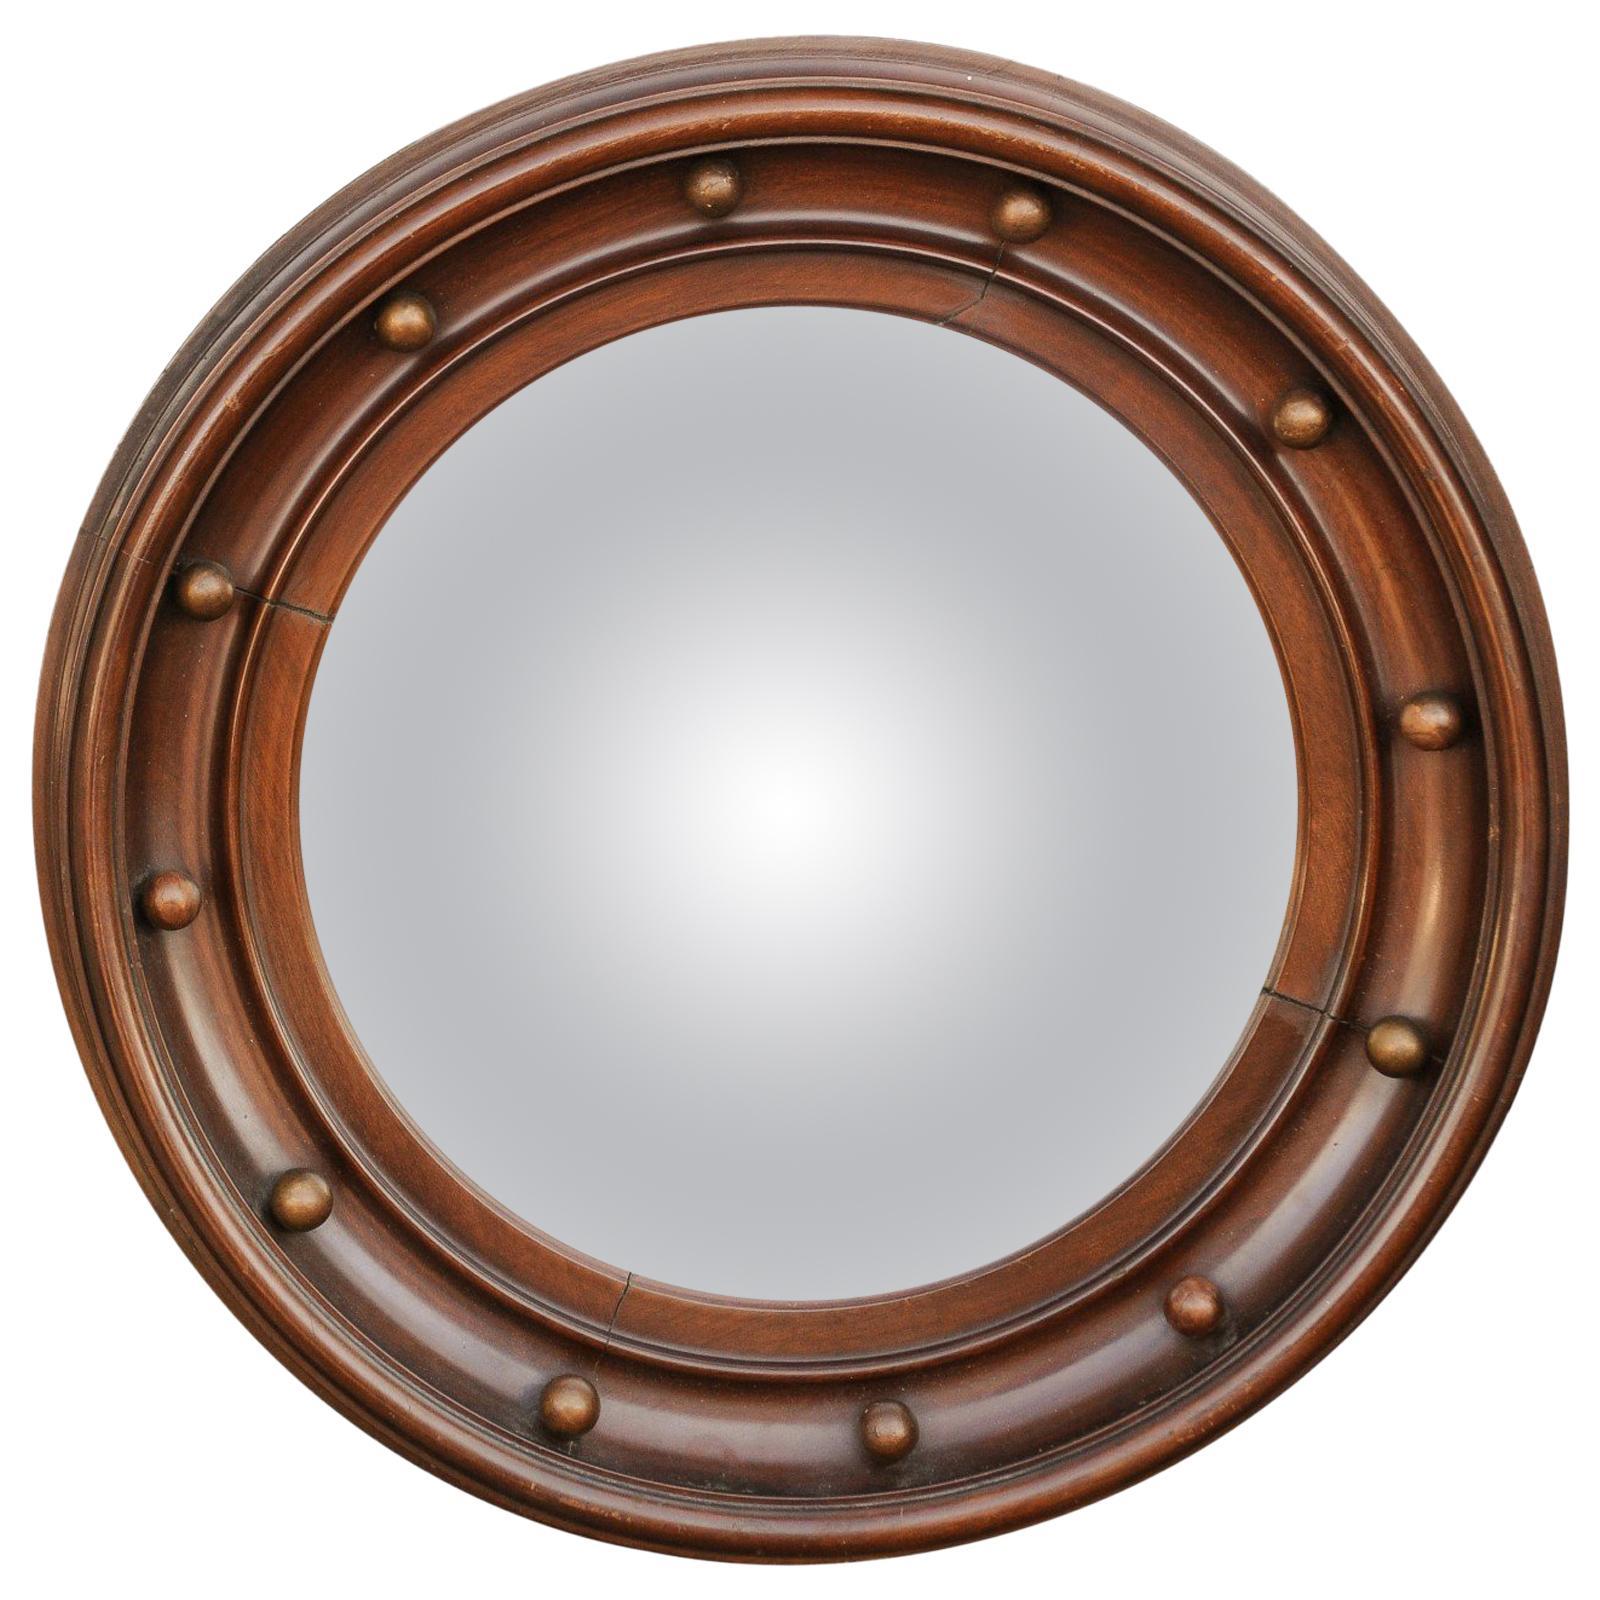 Vintage English Wooden Girandole Bullseye Convex Mirror from the Midcentury